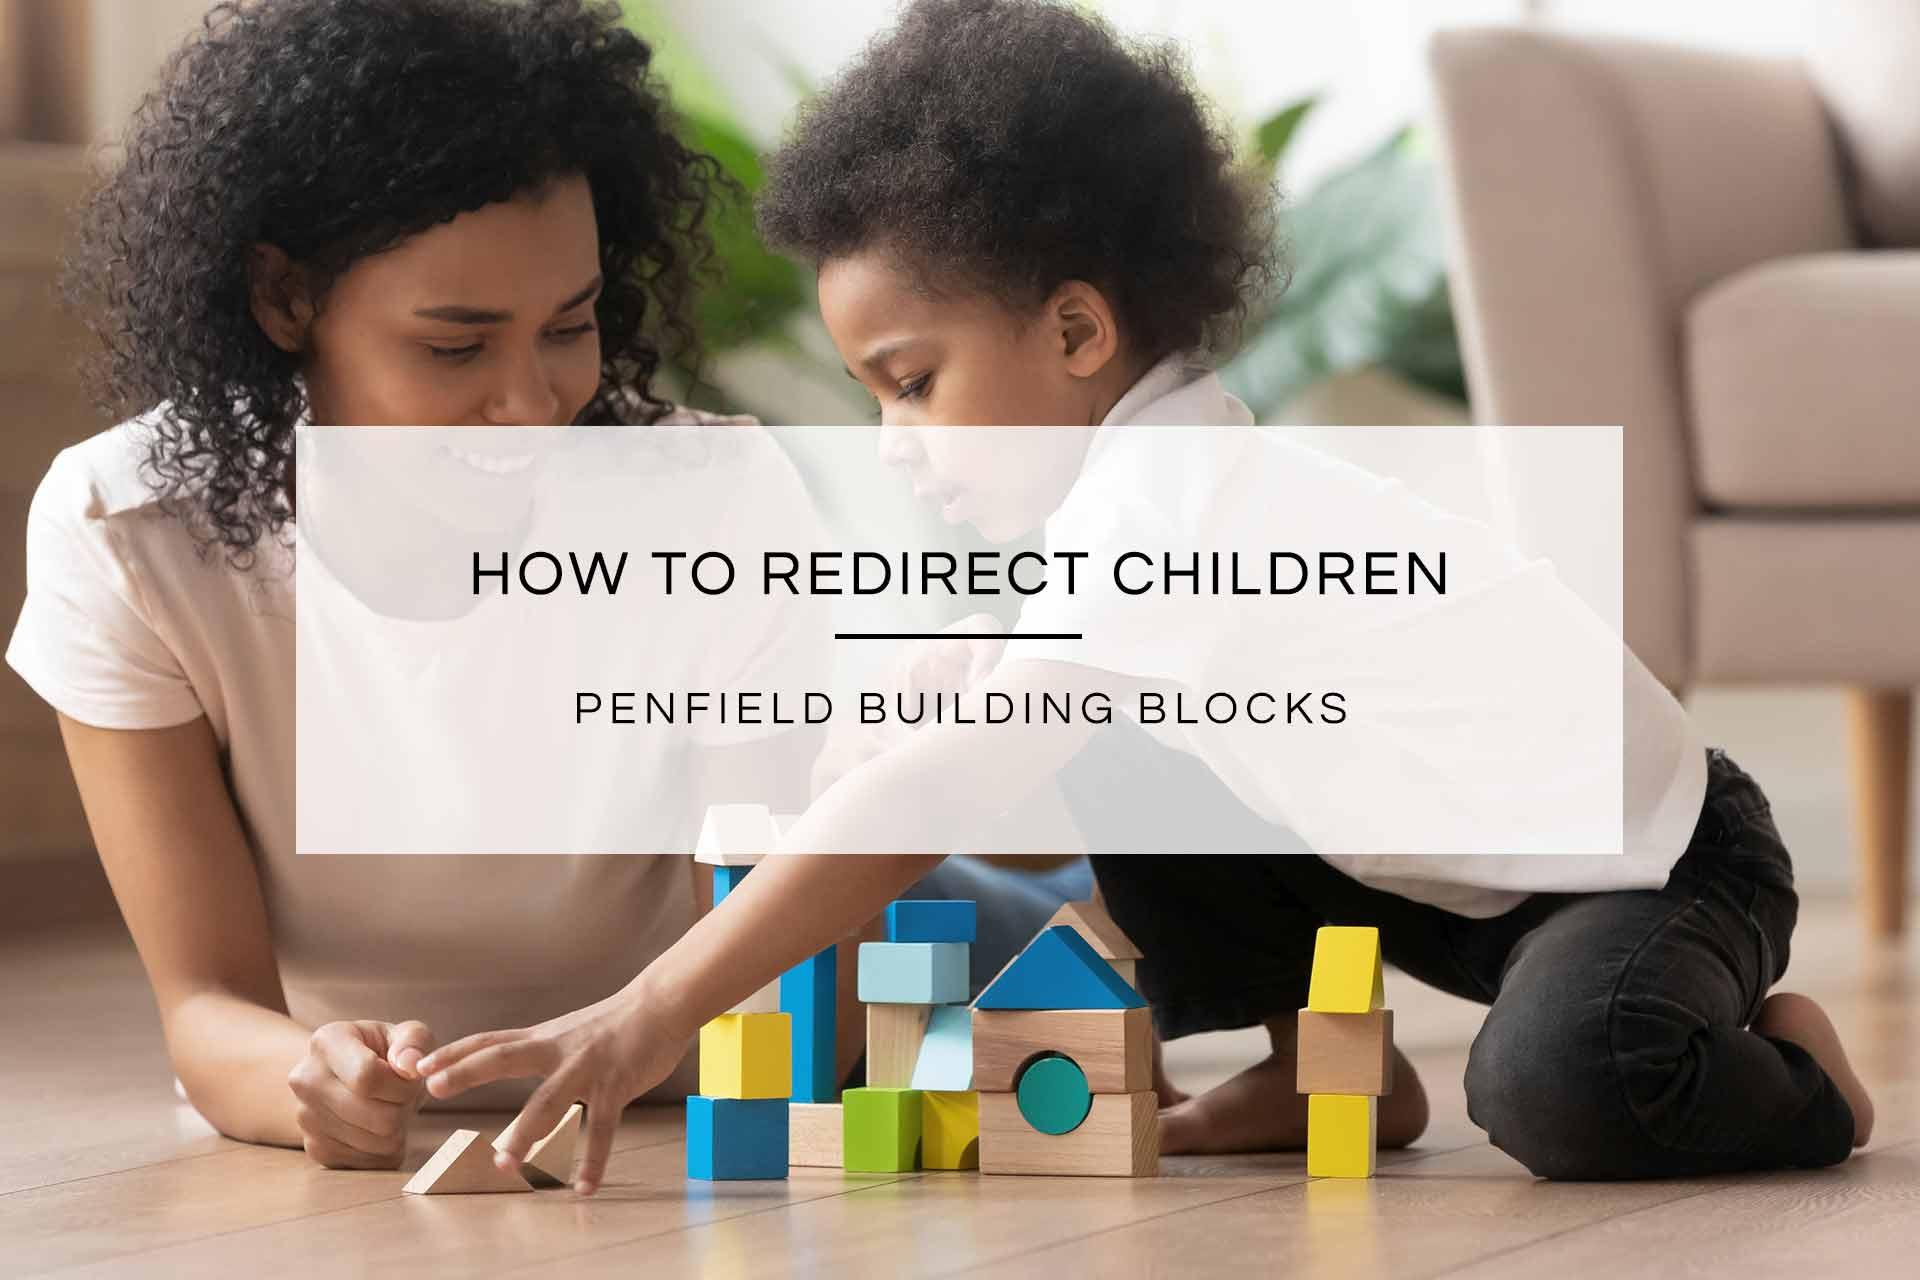 How to Redirect Children